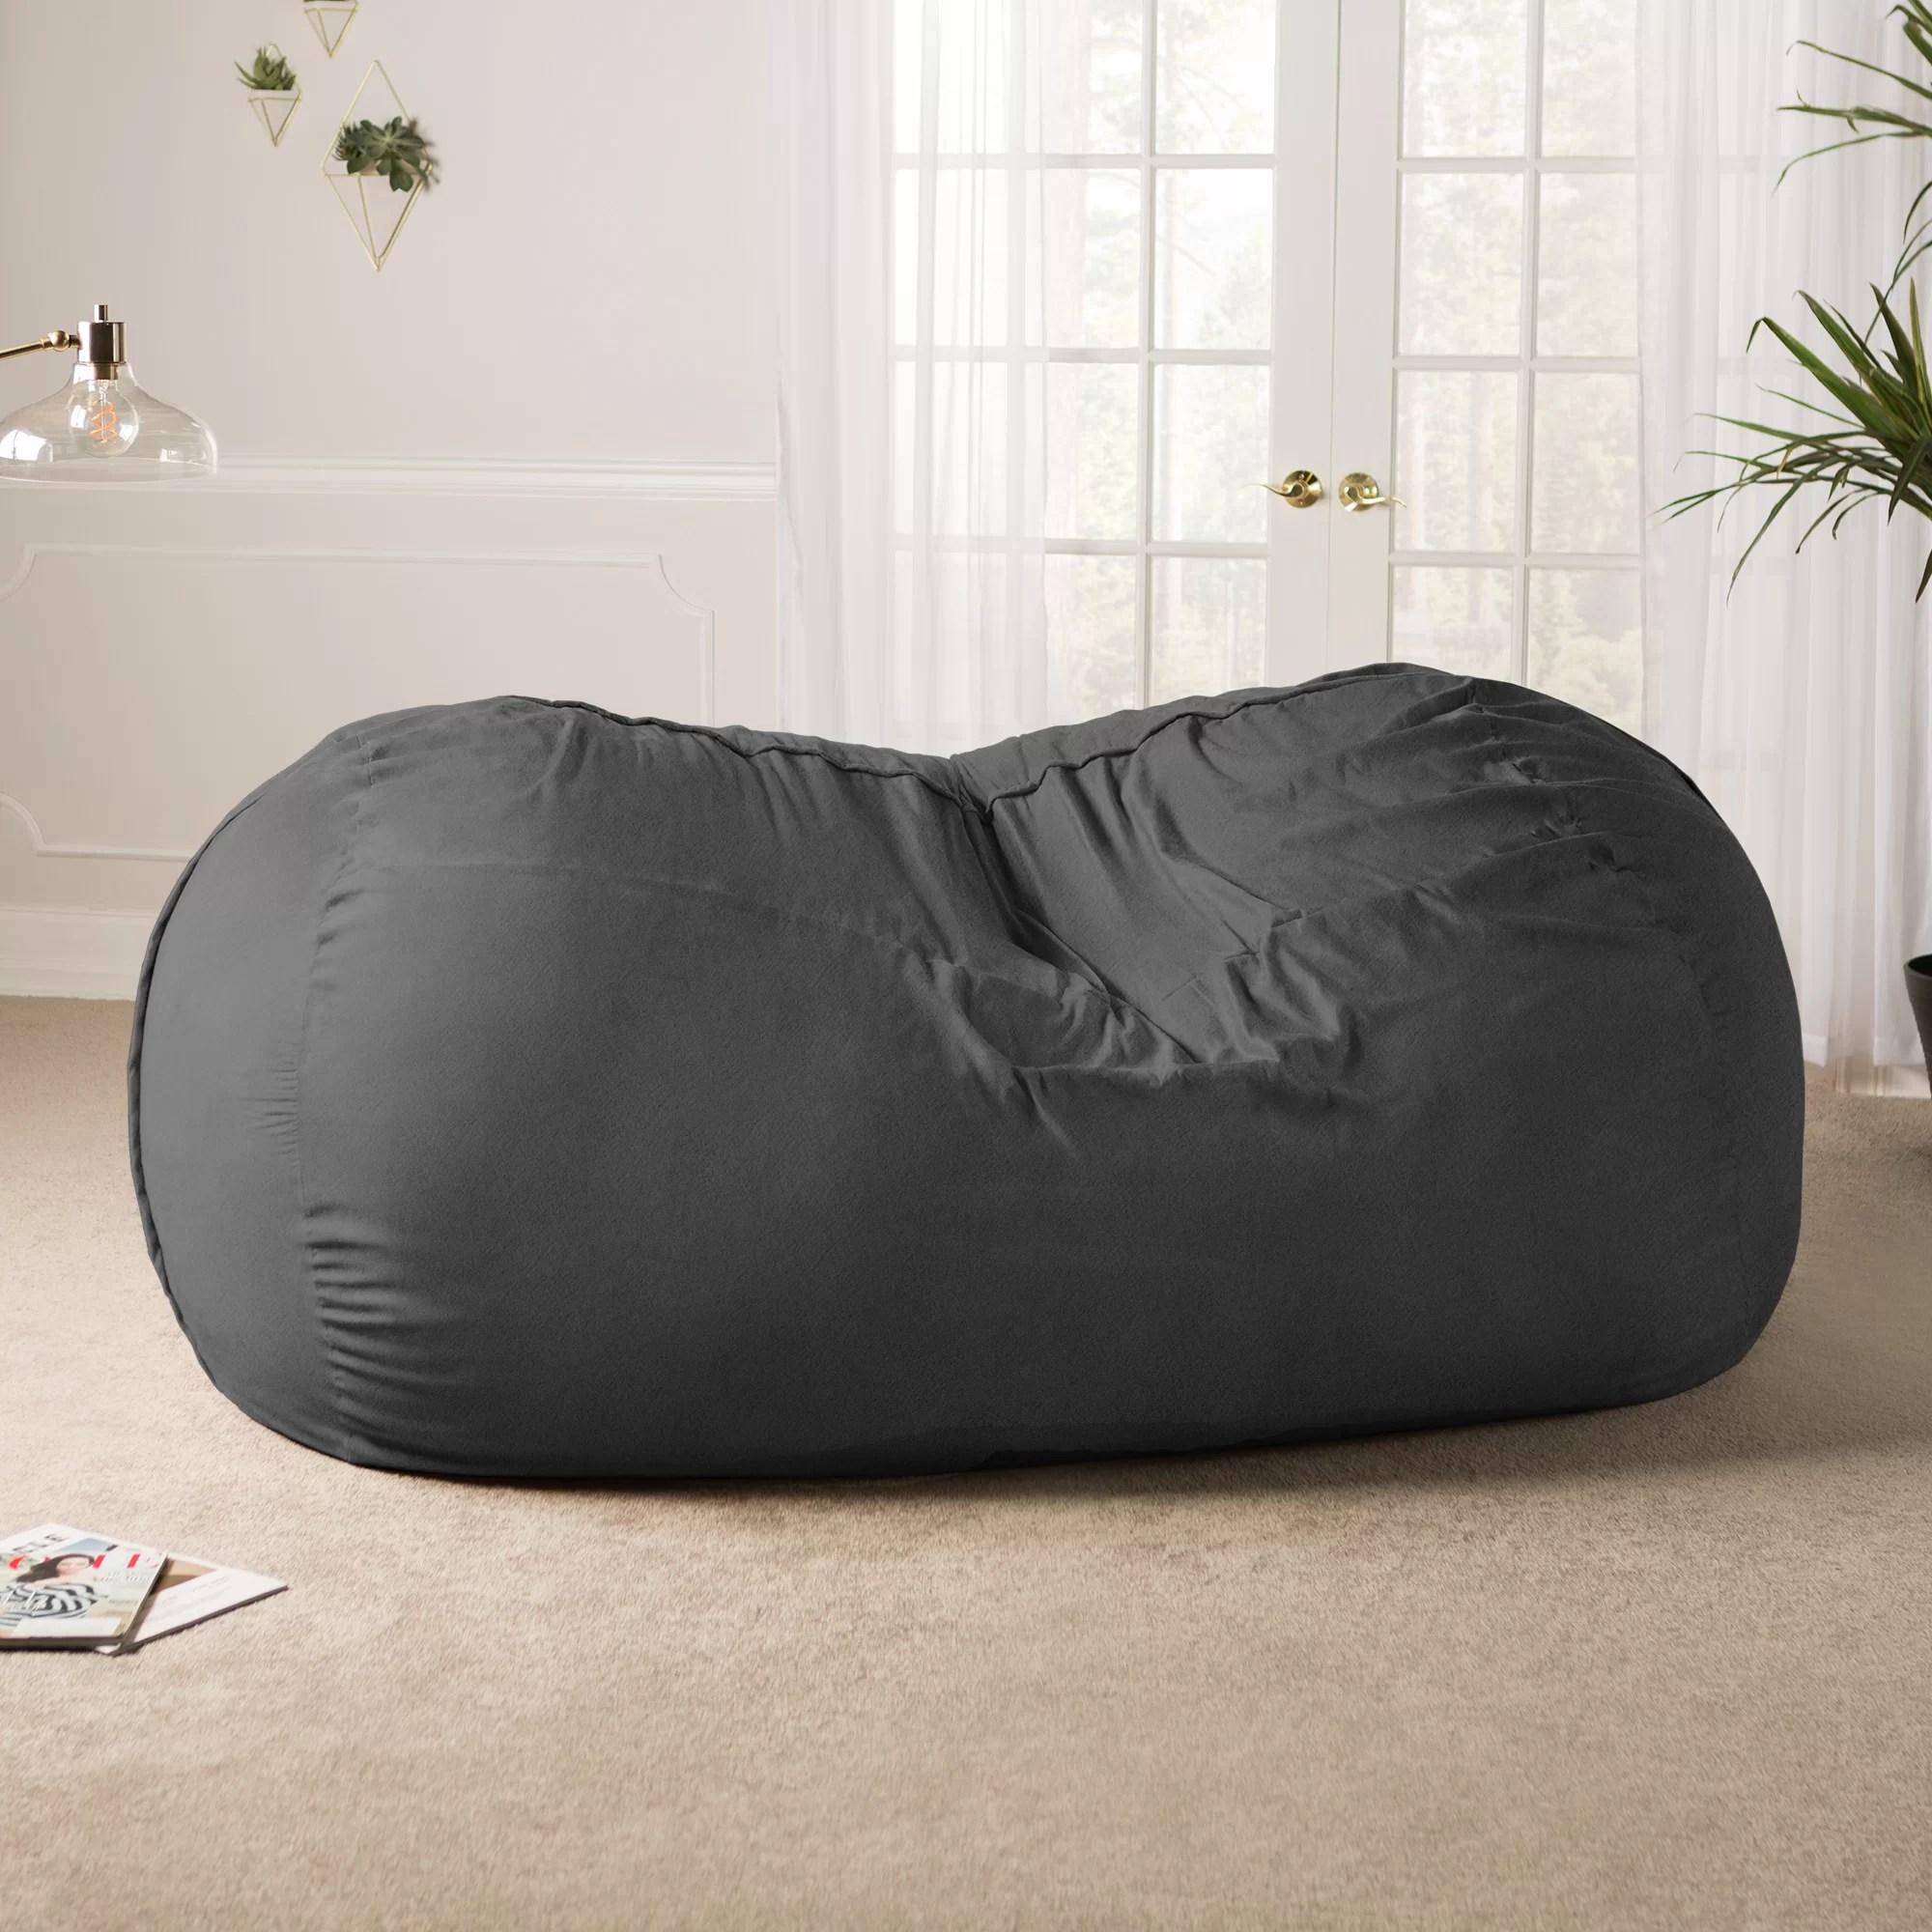 giant bean bag chair lawn with umbrella latitude run sofa reviews wayfair